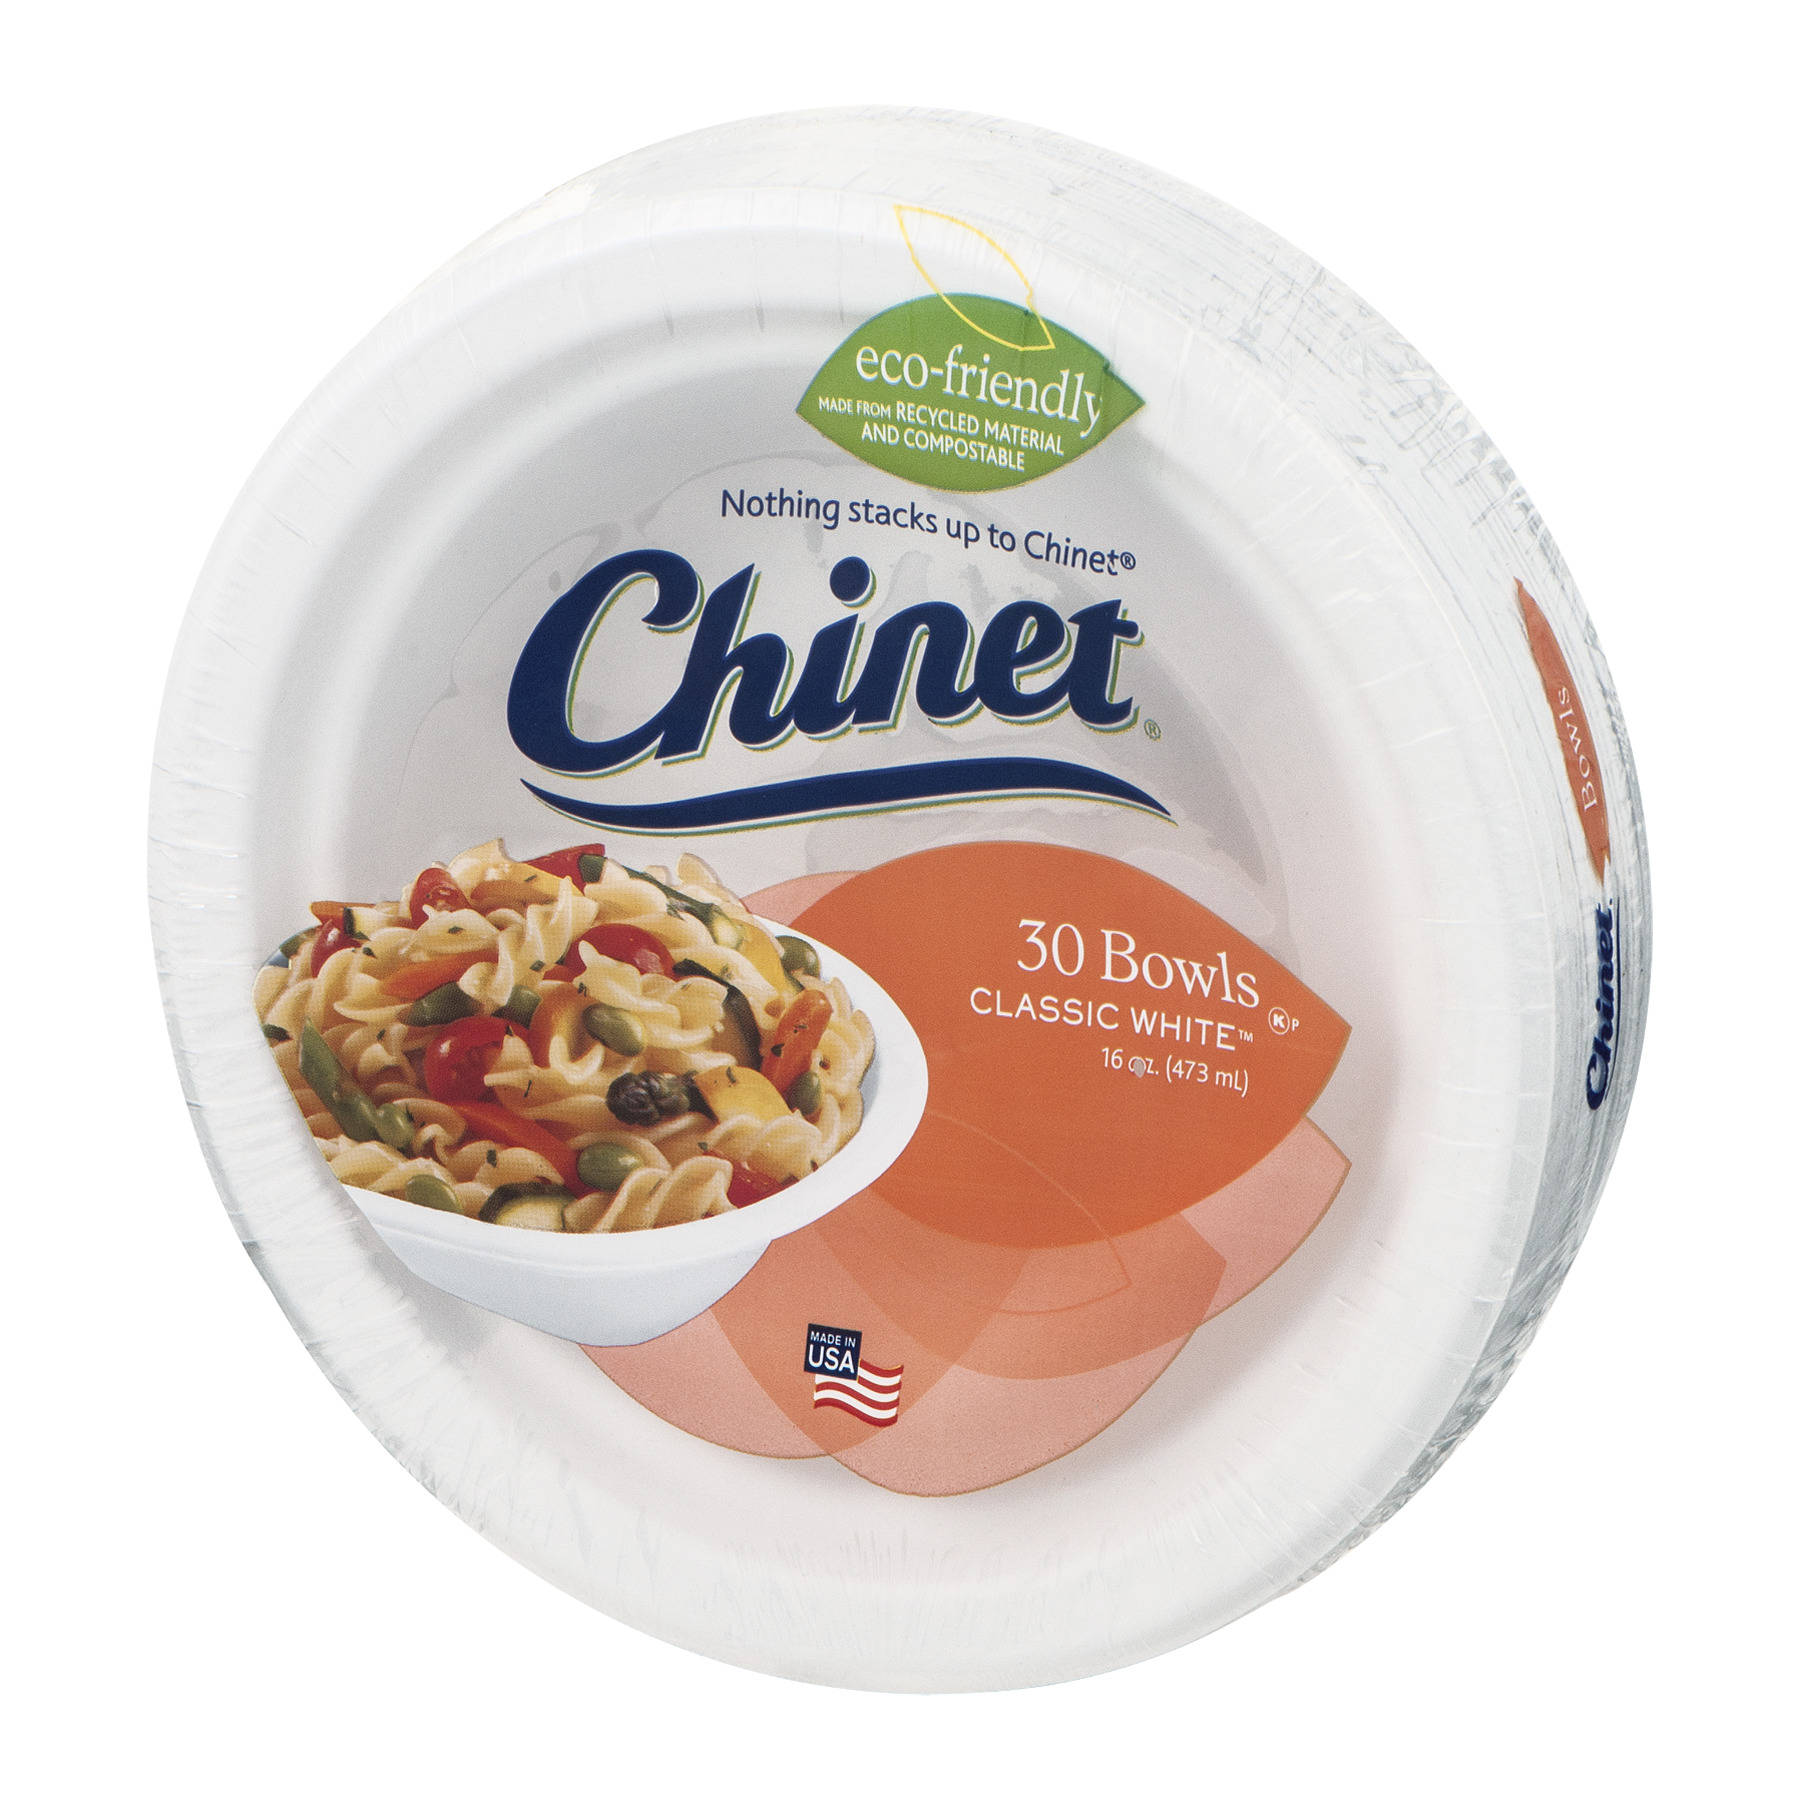 Chinet Bowls Classic White 30 Ct Walmart Com